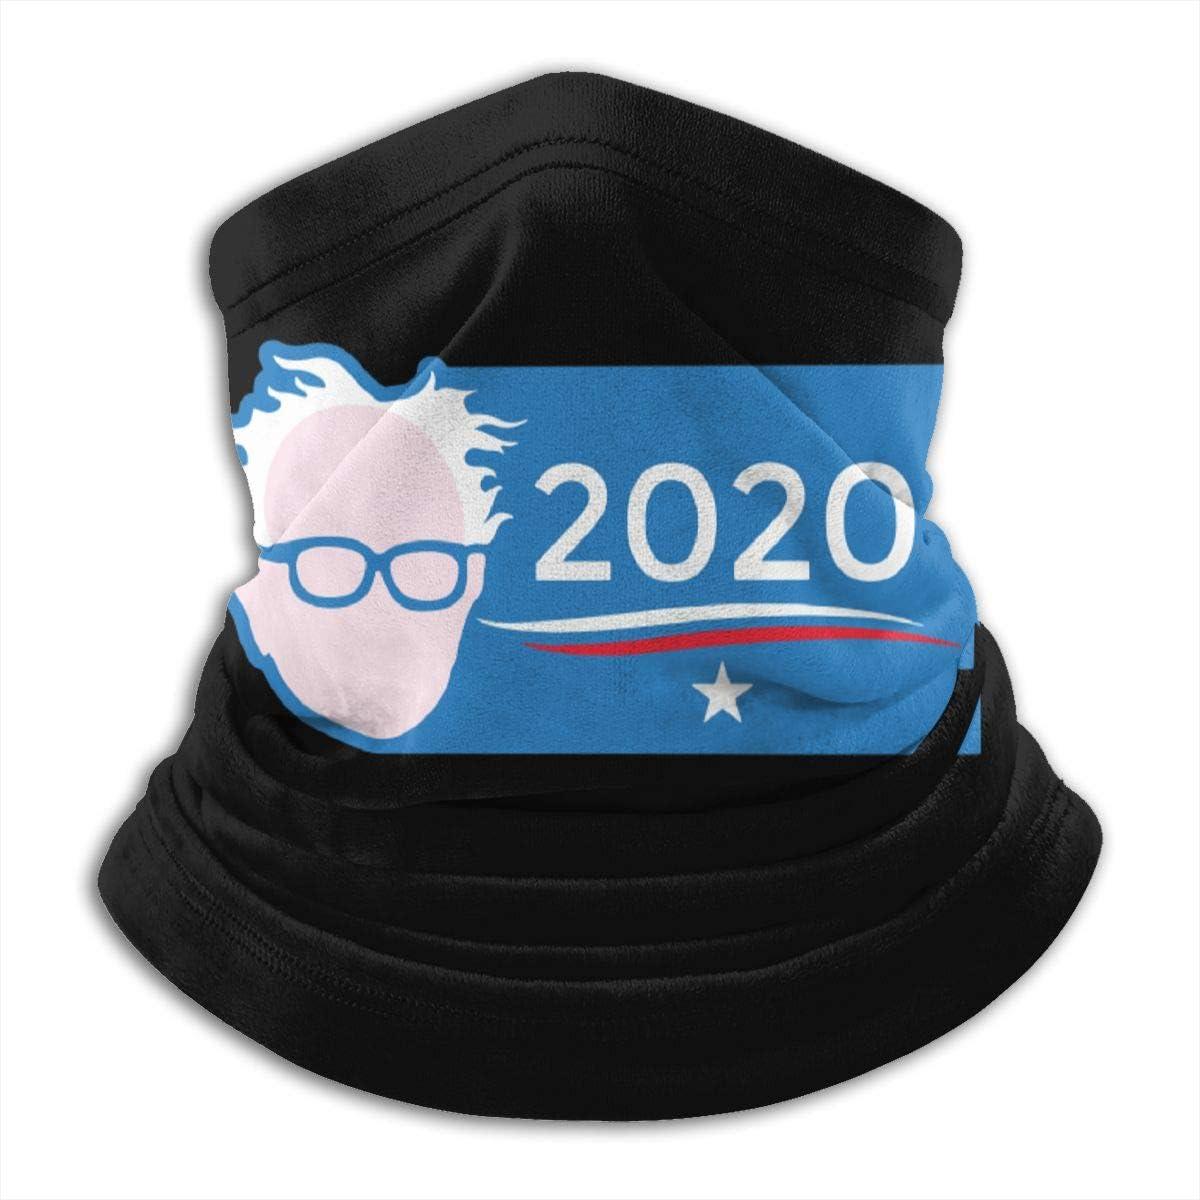 Bernie Sanders 2020 Black Multi-function Neck Warmer Gaiter Polyester Neck Warmer Windproof Winter Neck Gaiter Cold Weather Scarf For Men Women